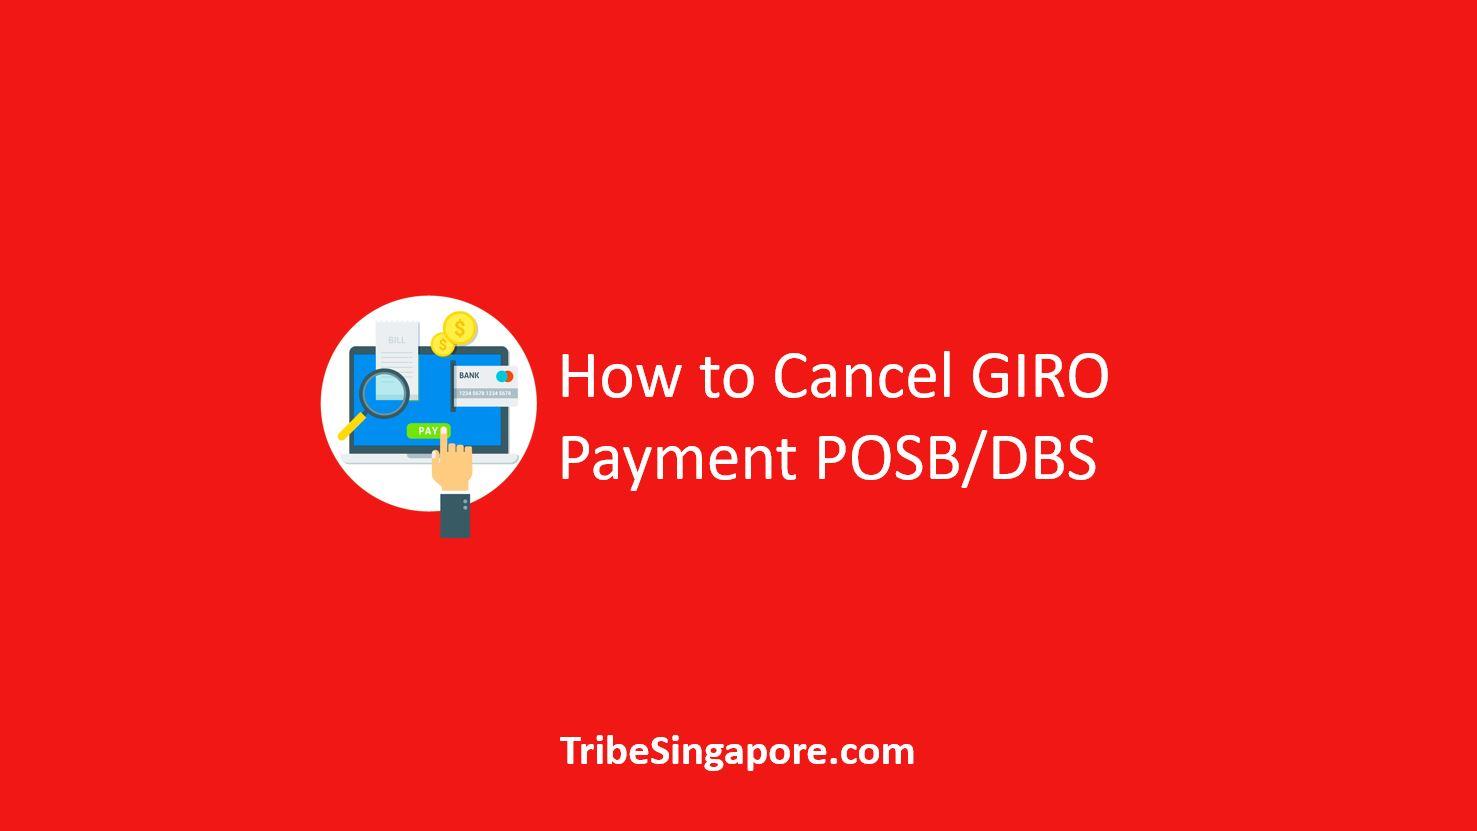 How to Cancel GIRO Payment POSB/DBS